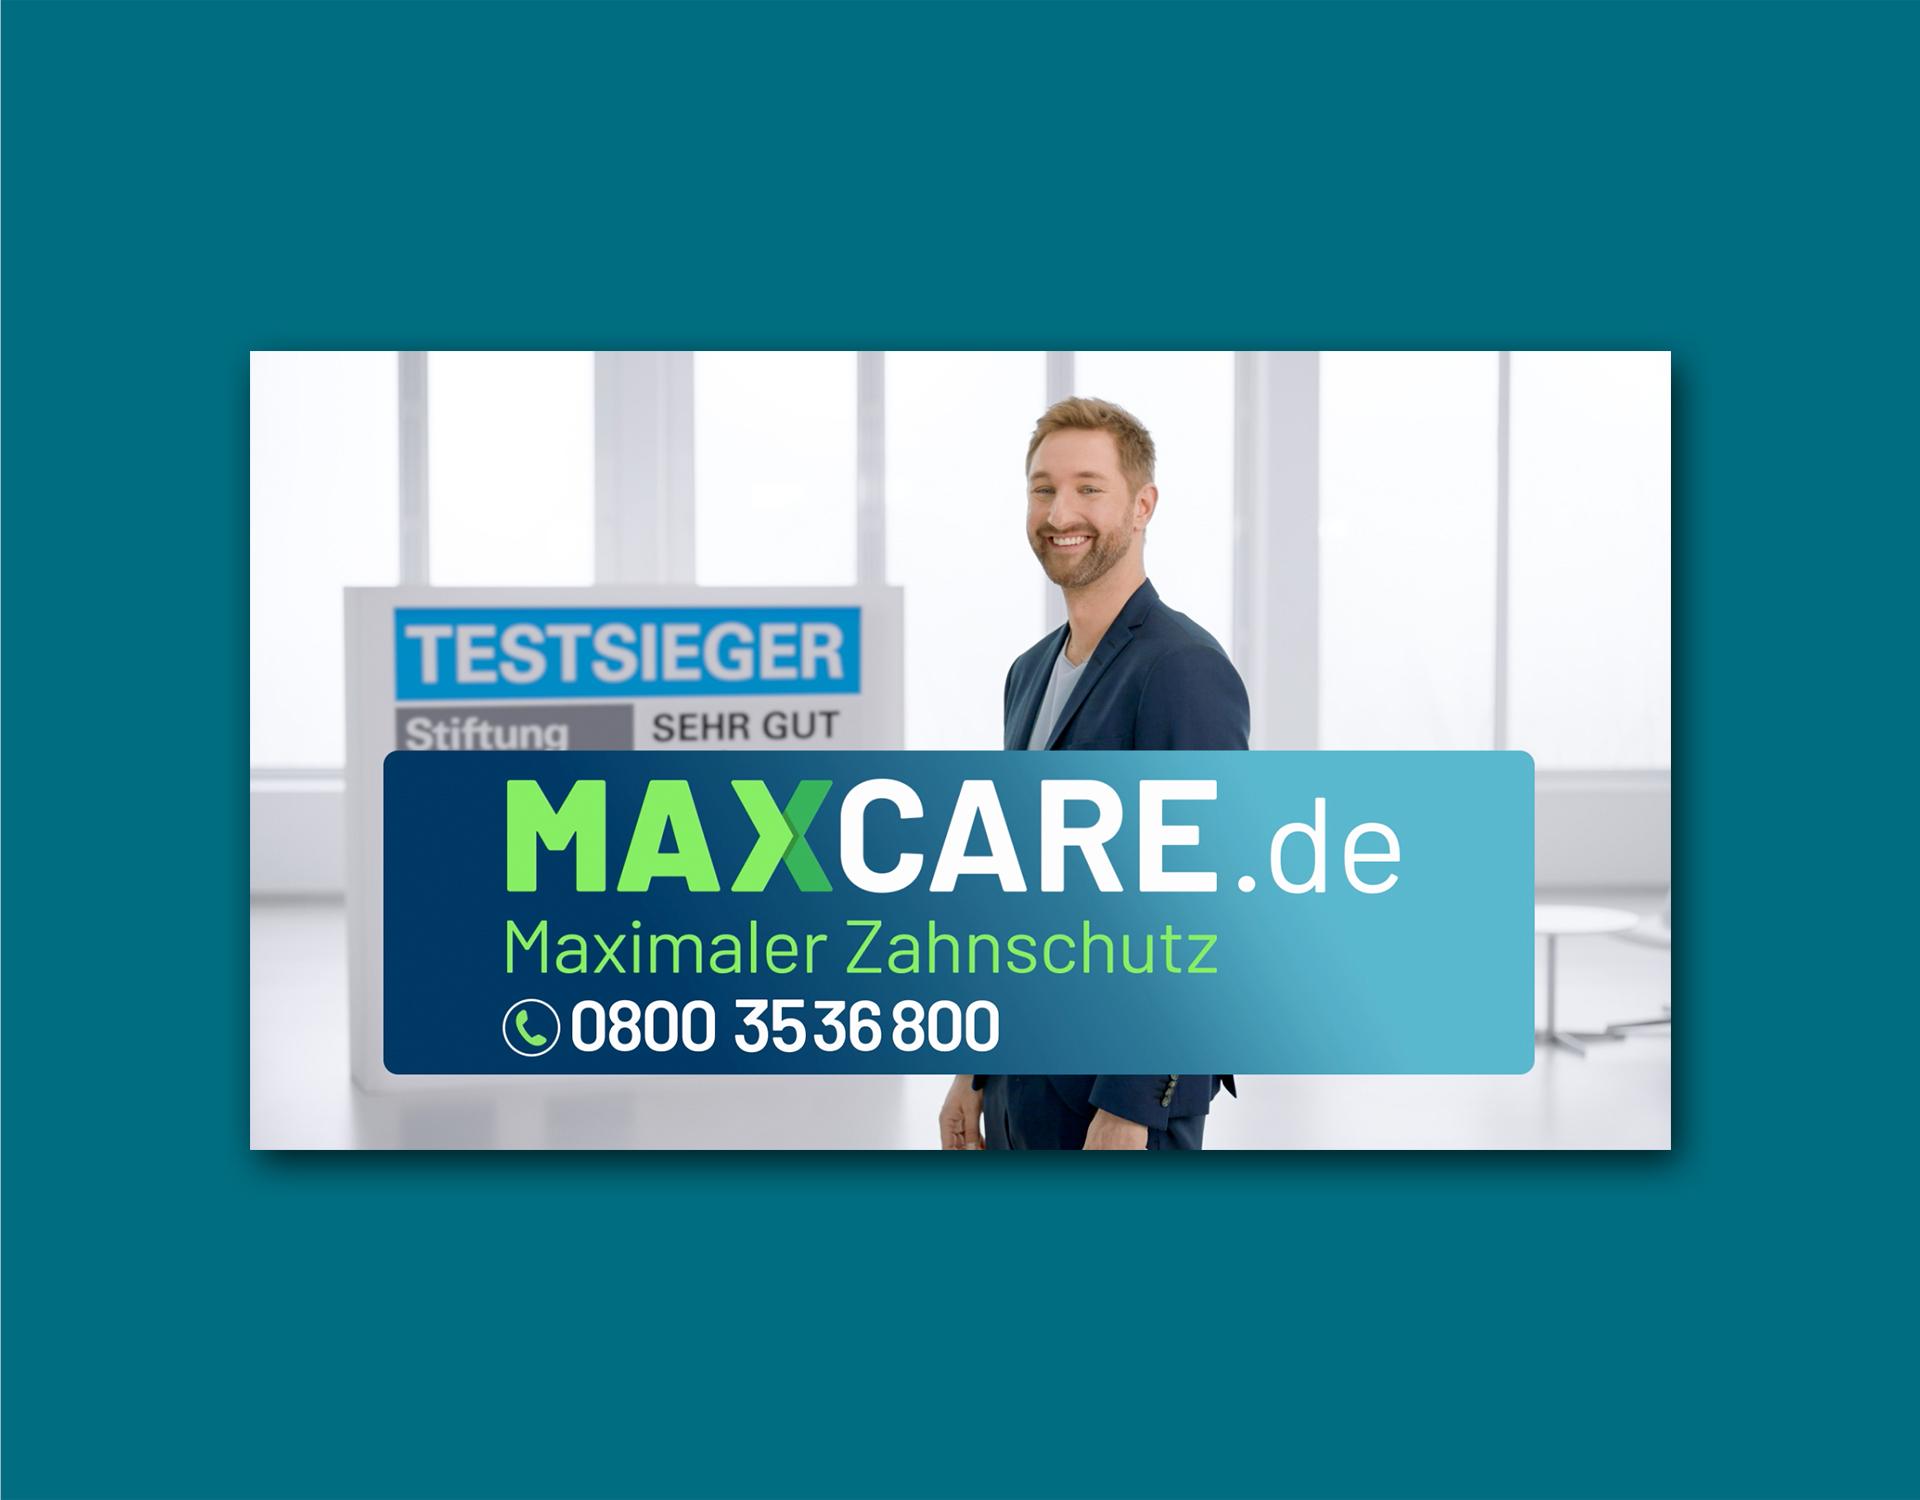 Maxcare – Testsieger